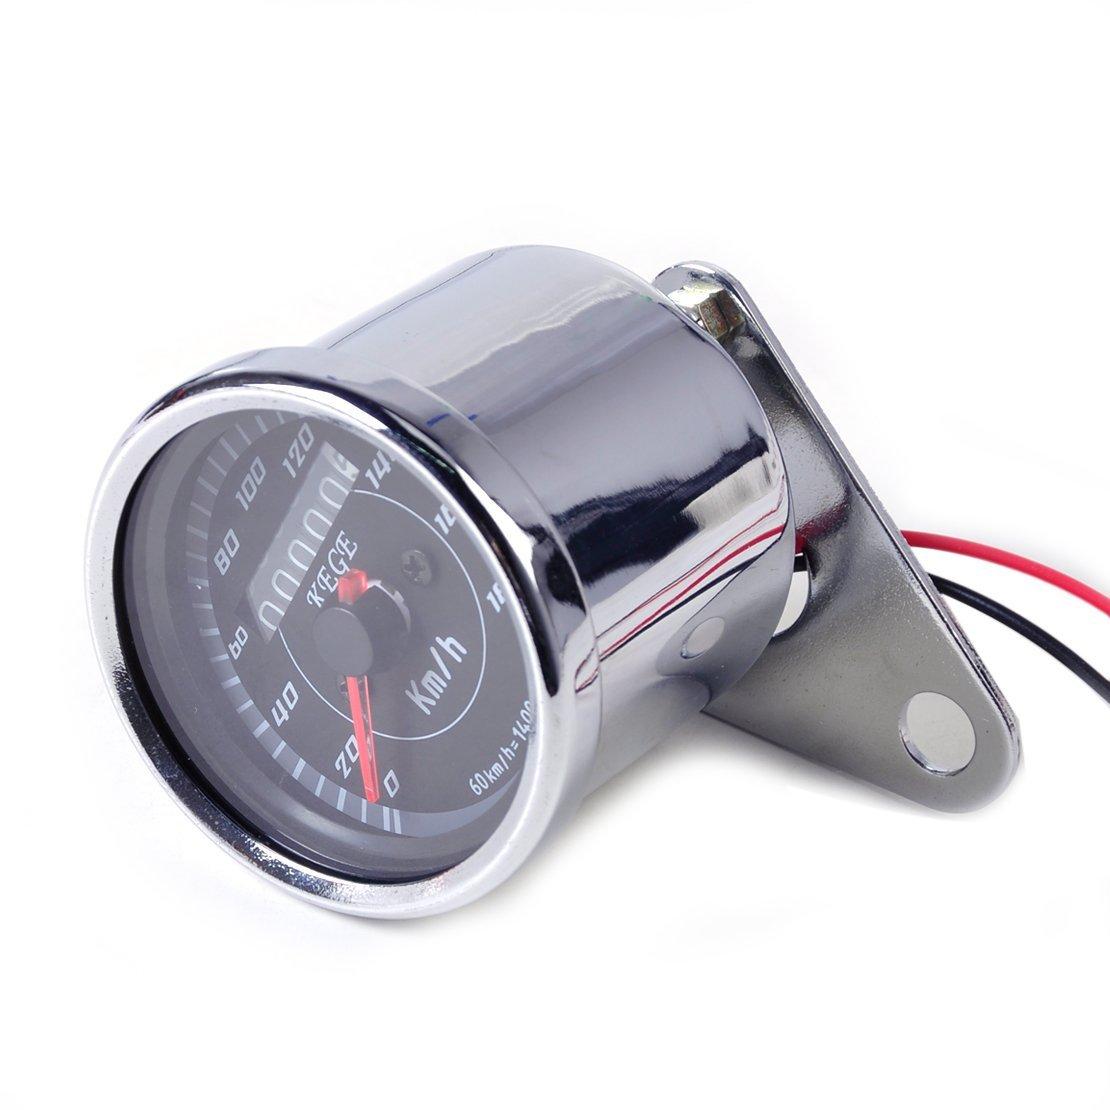 uxcell Universal 12V Motorcycle LED Backlight Dual Odometer Speedometer Gauge Meter